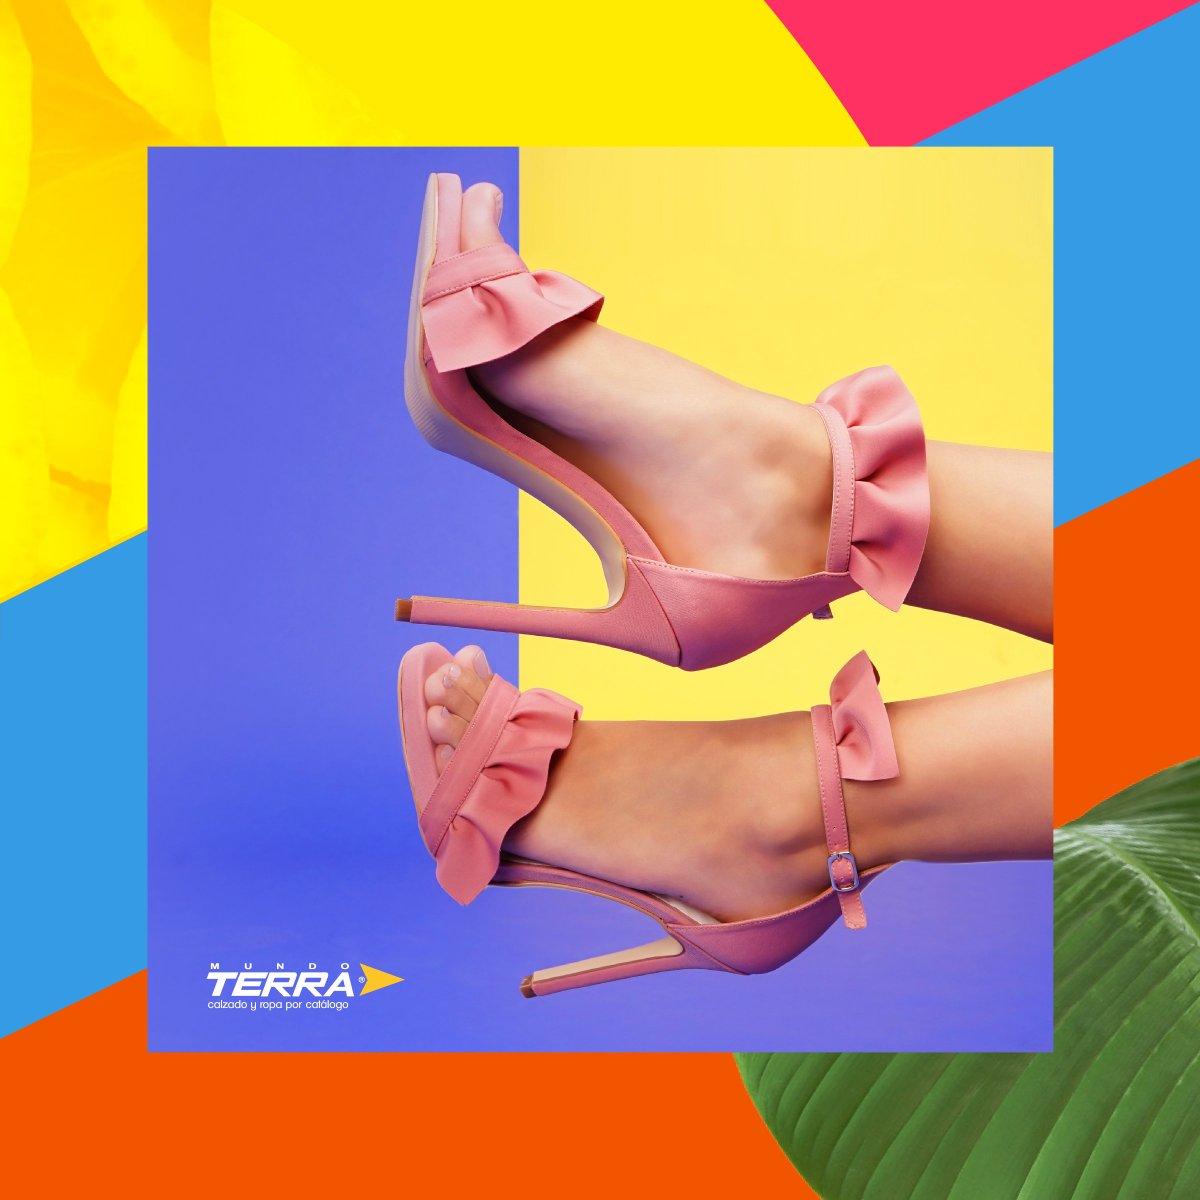 Si buscas estilizar las piernas opta por calzados con tacón medio a alto, pero finito.  #mundoterra #shoes #tacones #heels https://t.co/EUYvAIMYAK